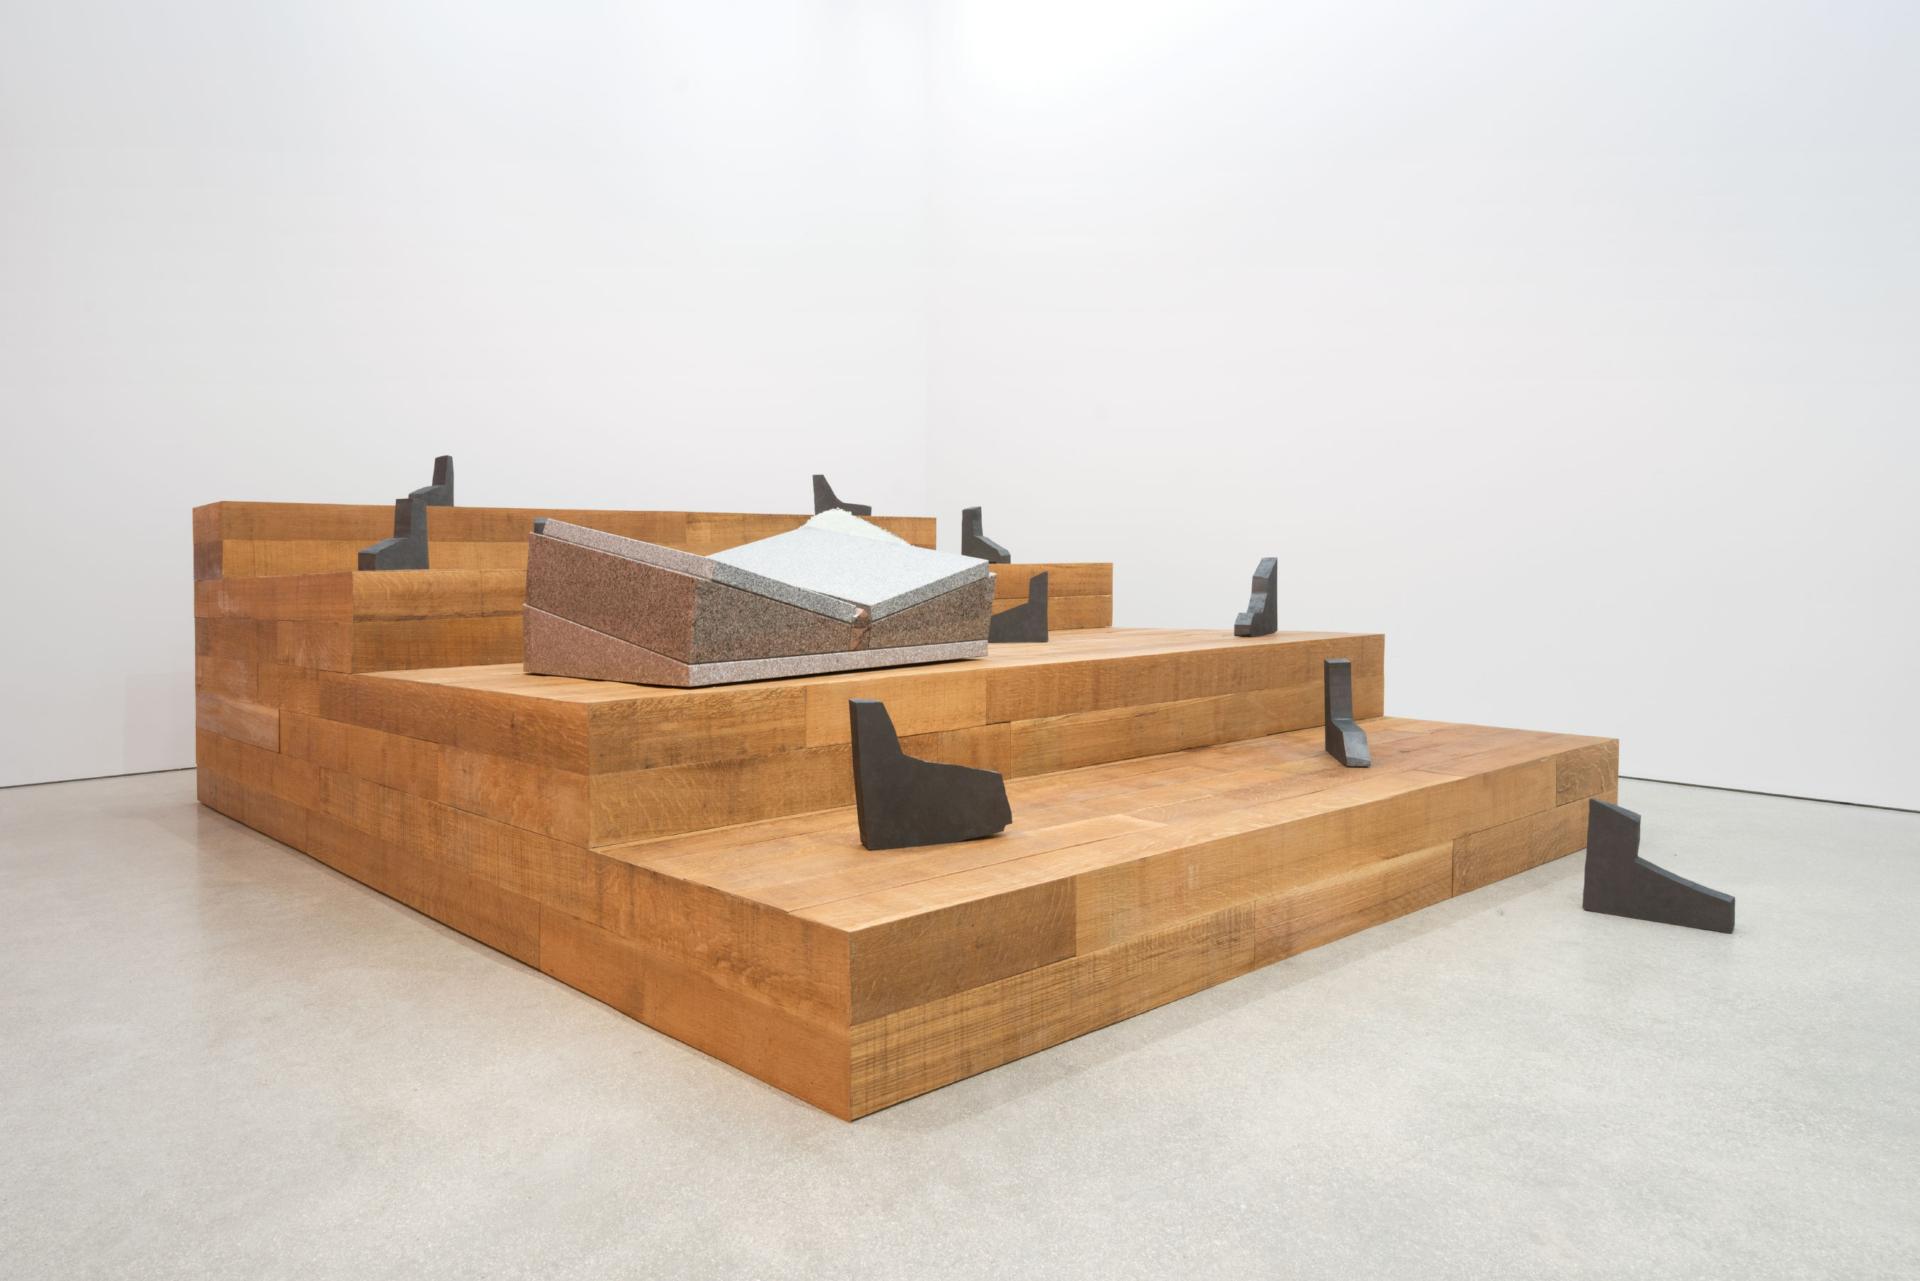 STUDIO  LHOOQ Shana Lutker: Again Against, A Foot, A Back, A Wall